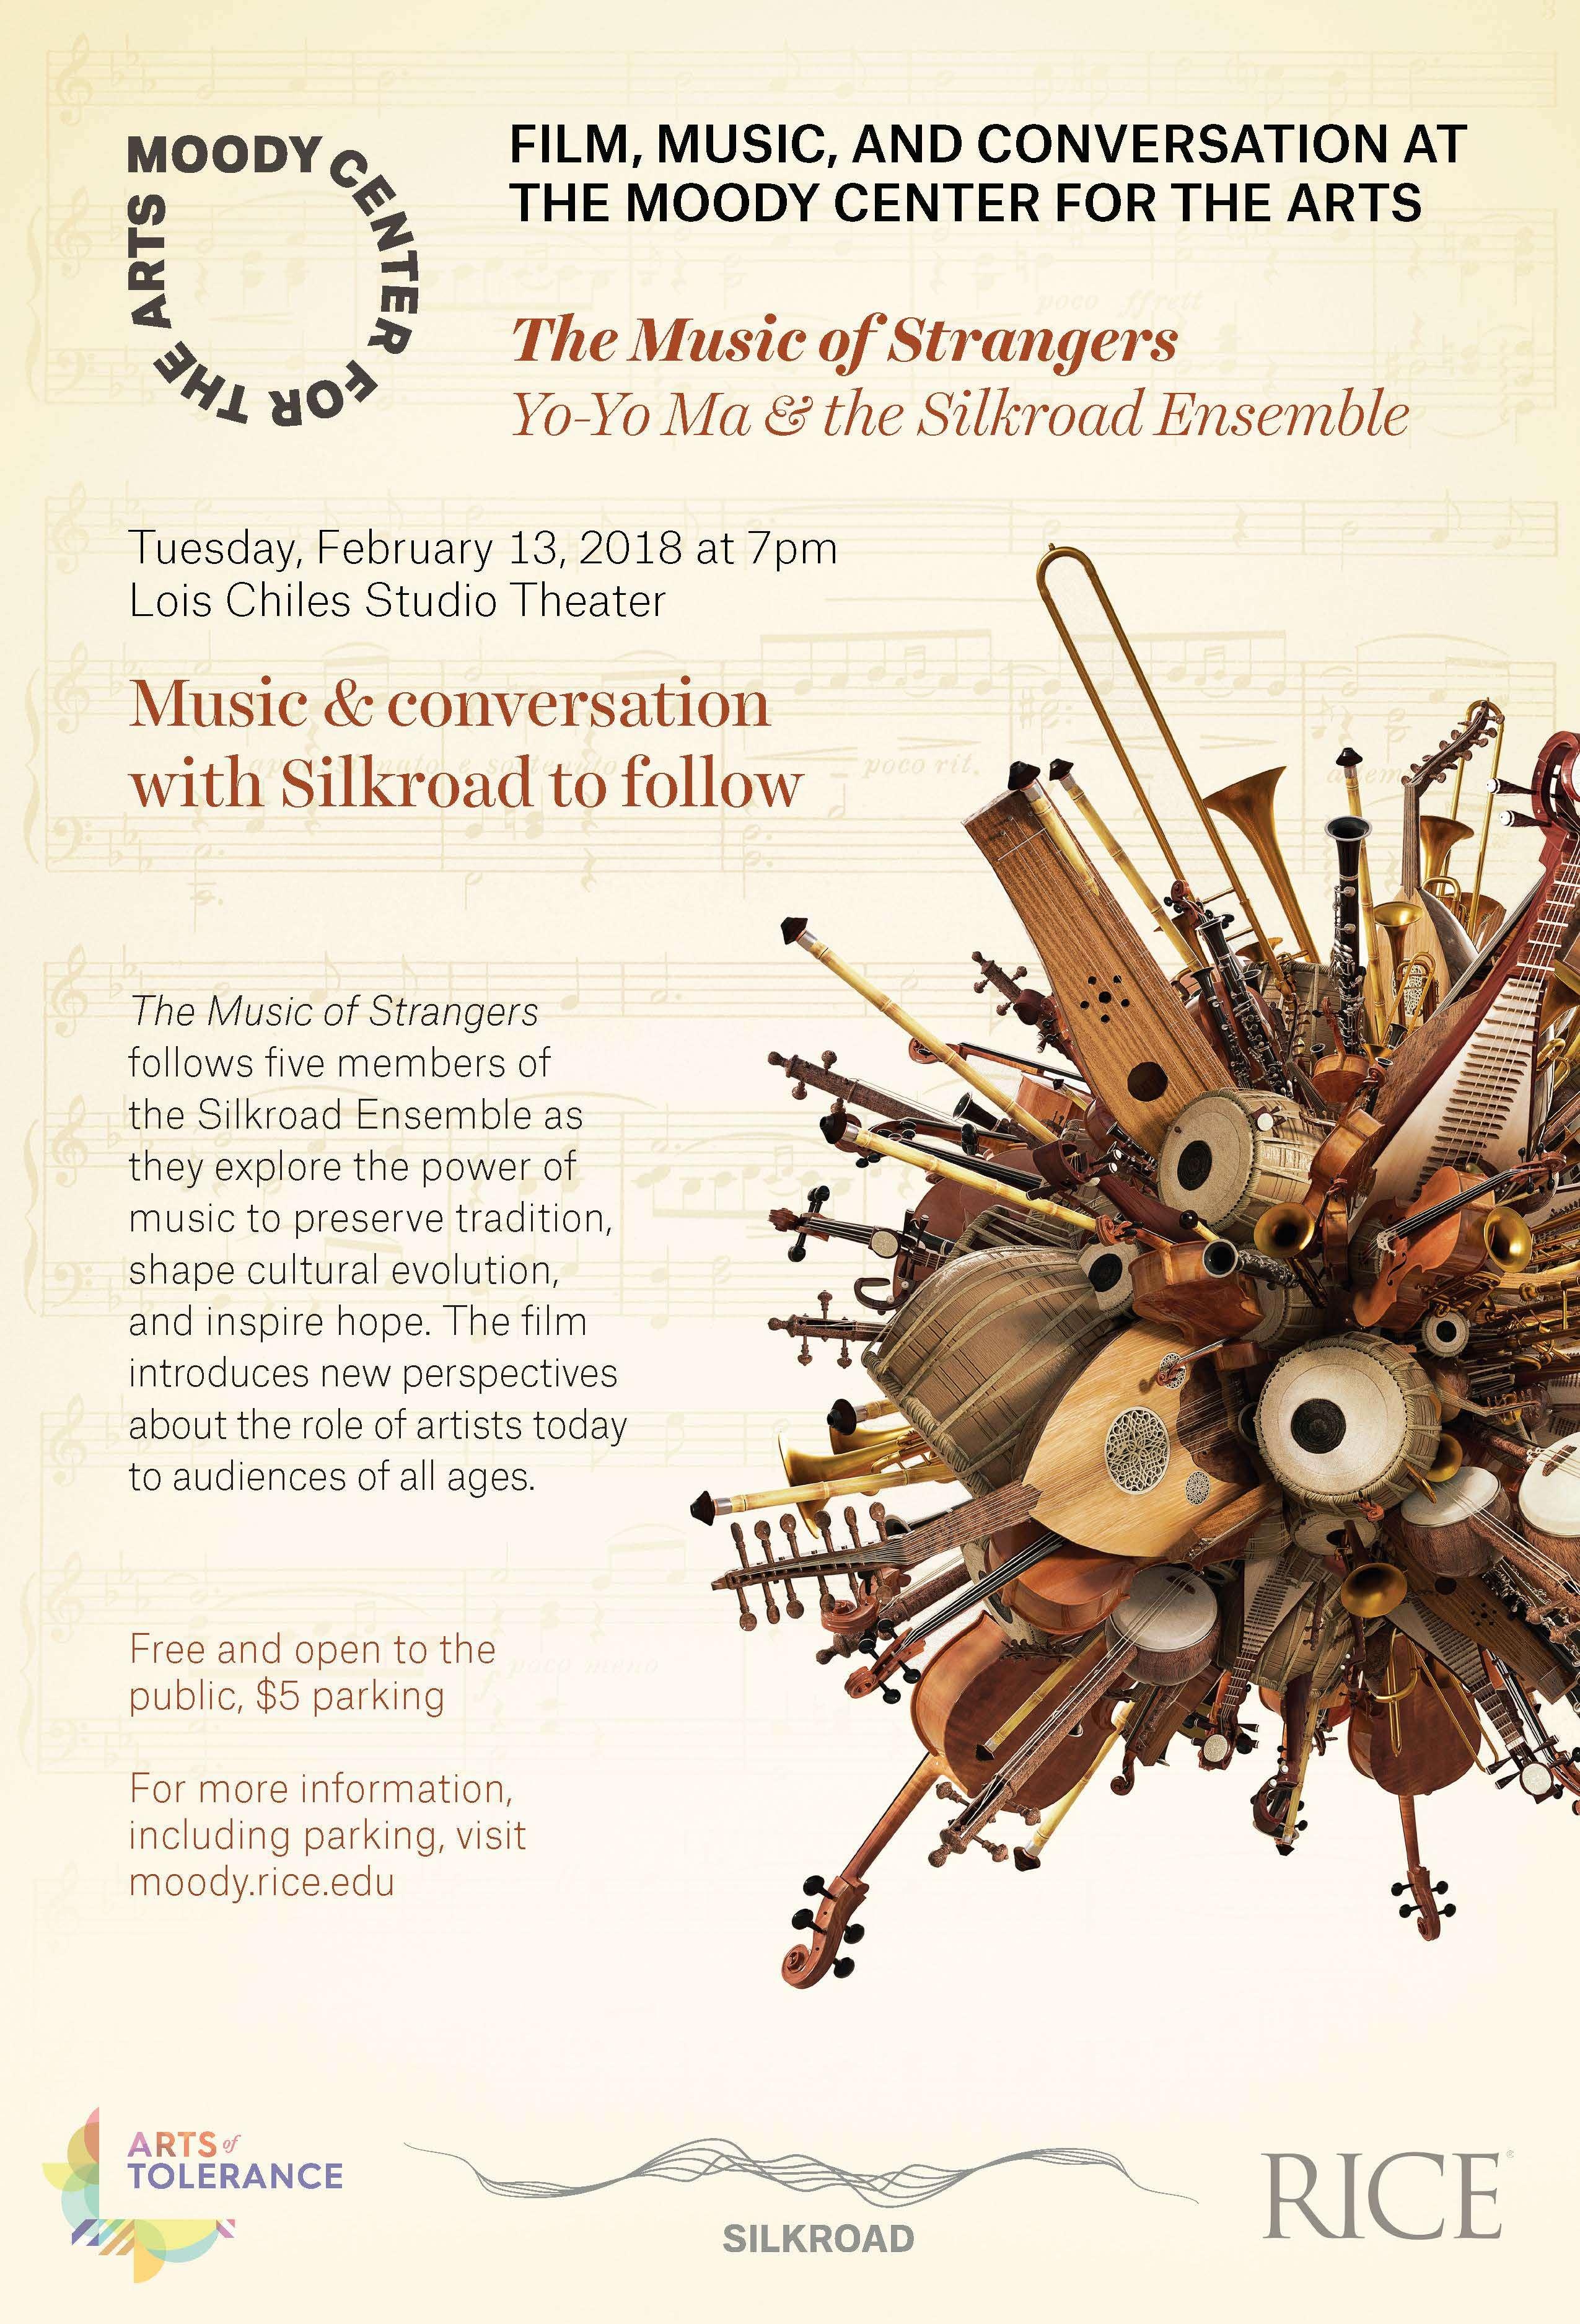 Movie poster for The Music of Strangers: Yo-Yo Ma & The Silk Road Ensemble